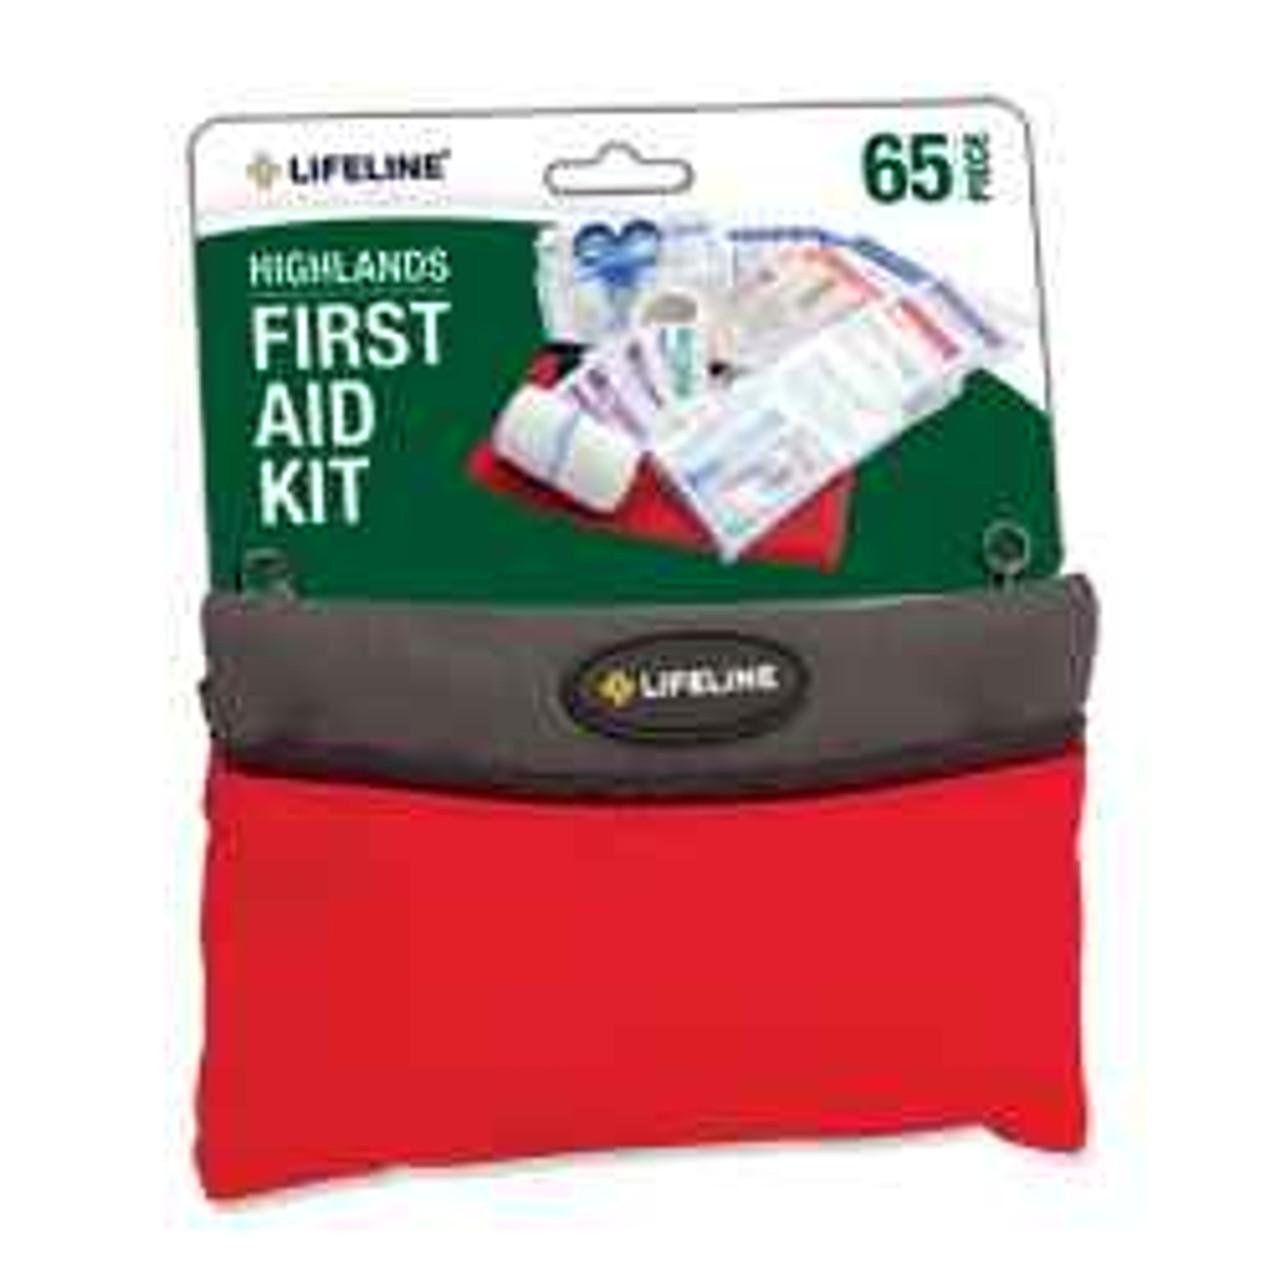 LifeLine Highlands First Aid Kit